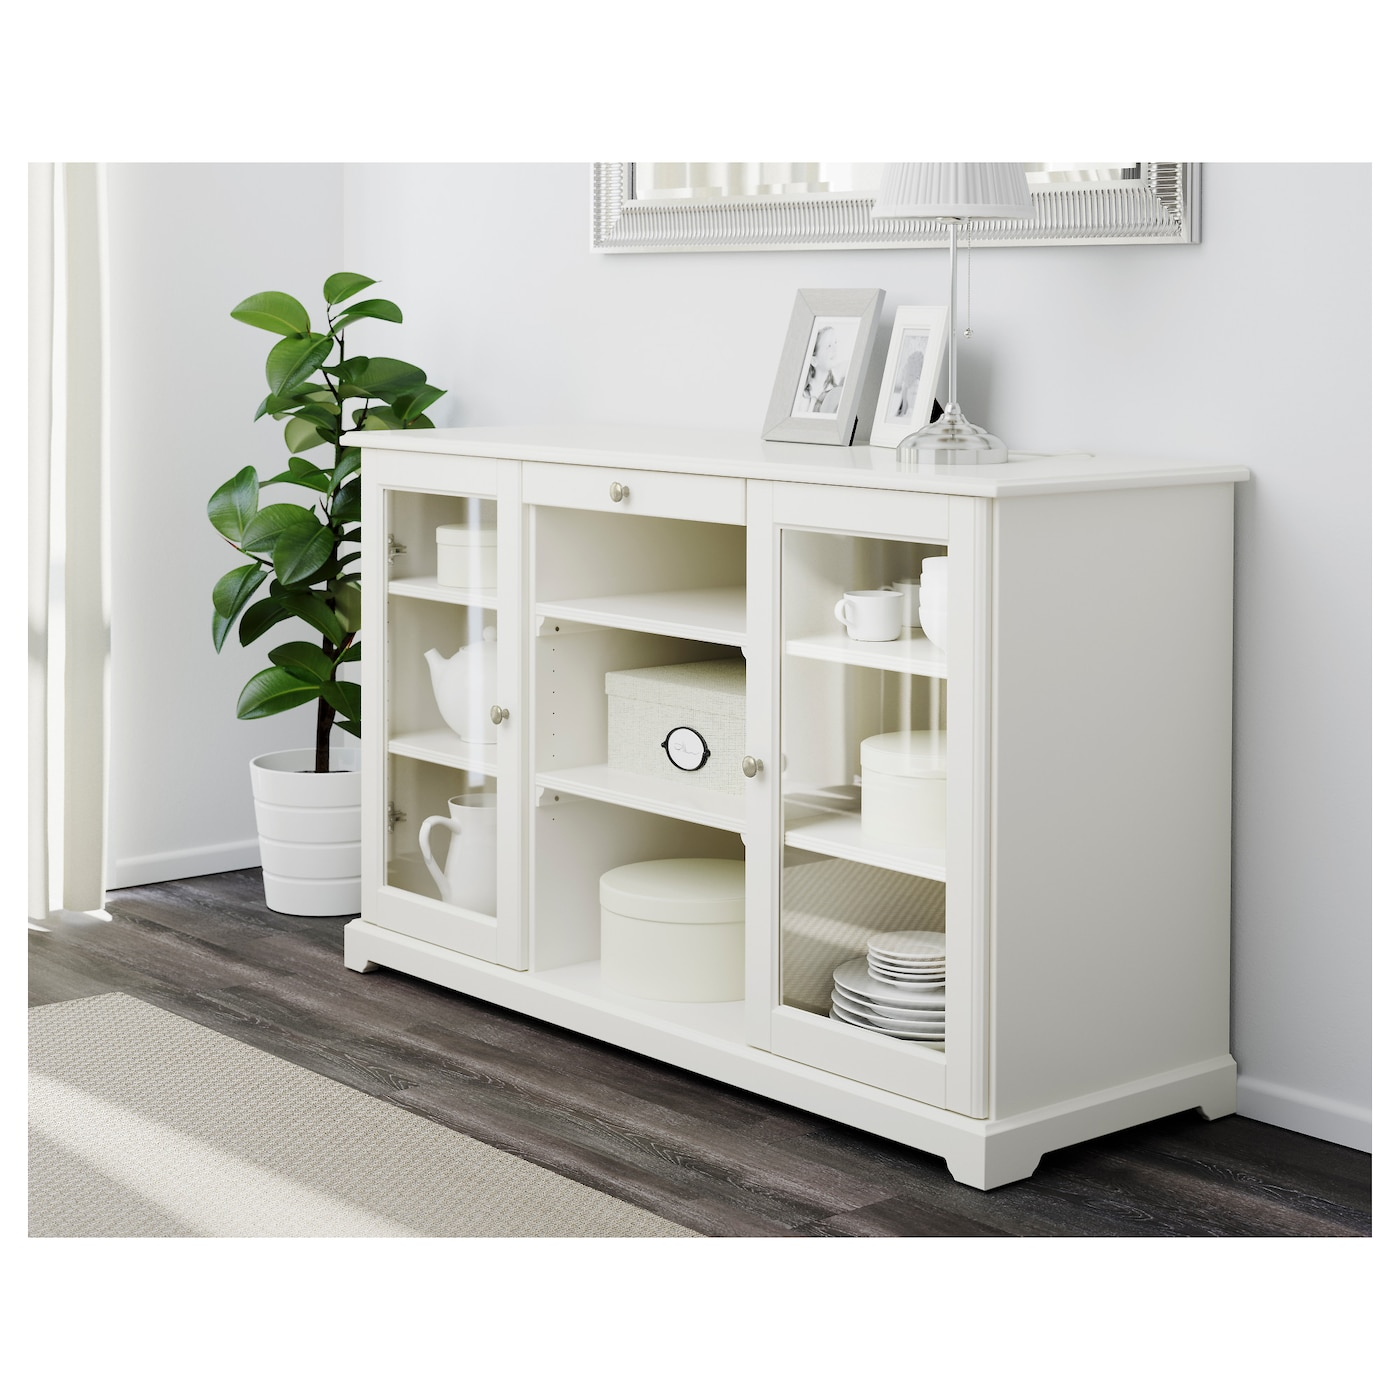 liatorp sideboard white 145 x 87 cm - ikea